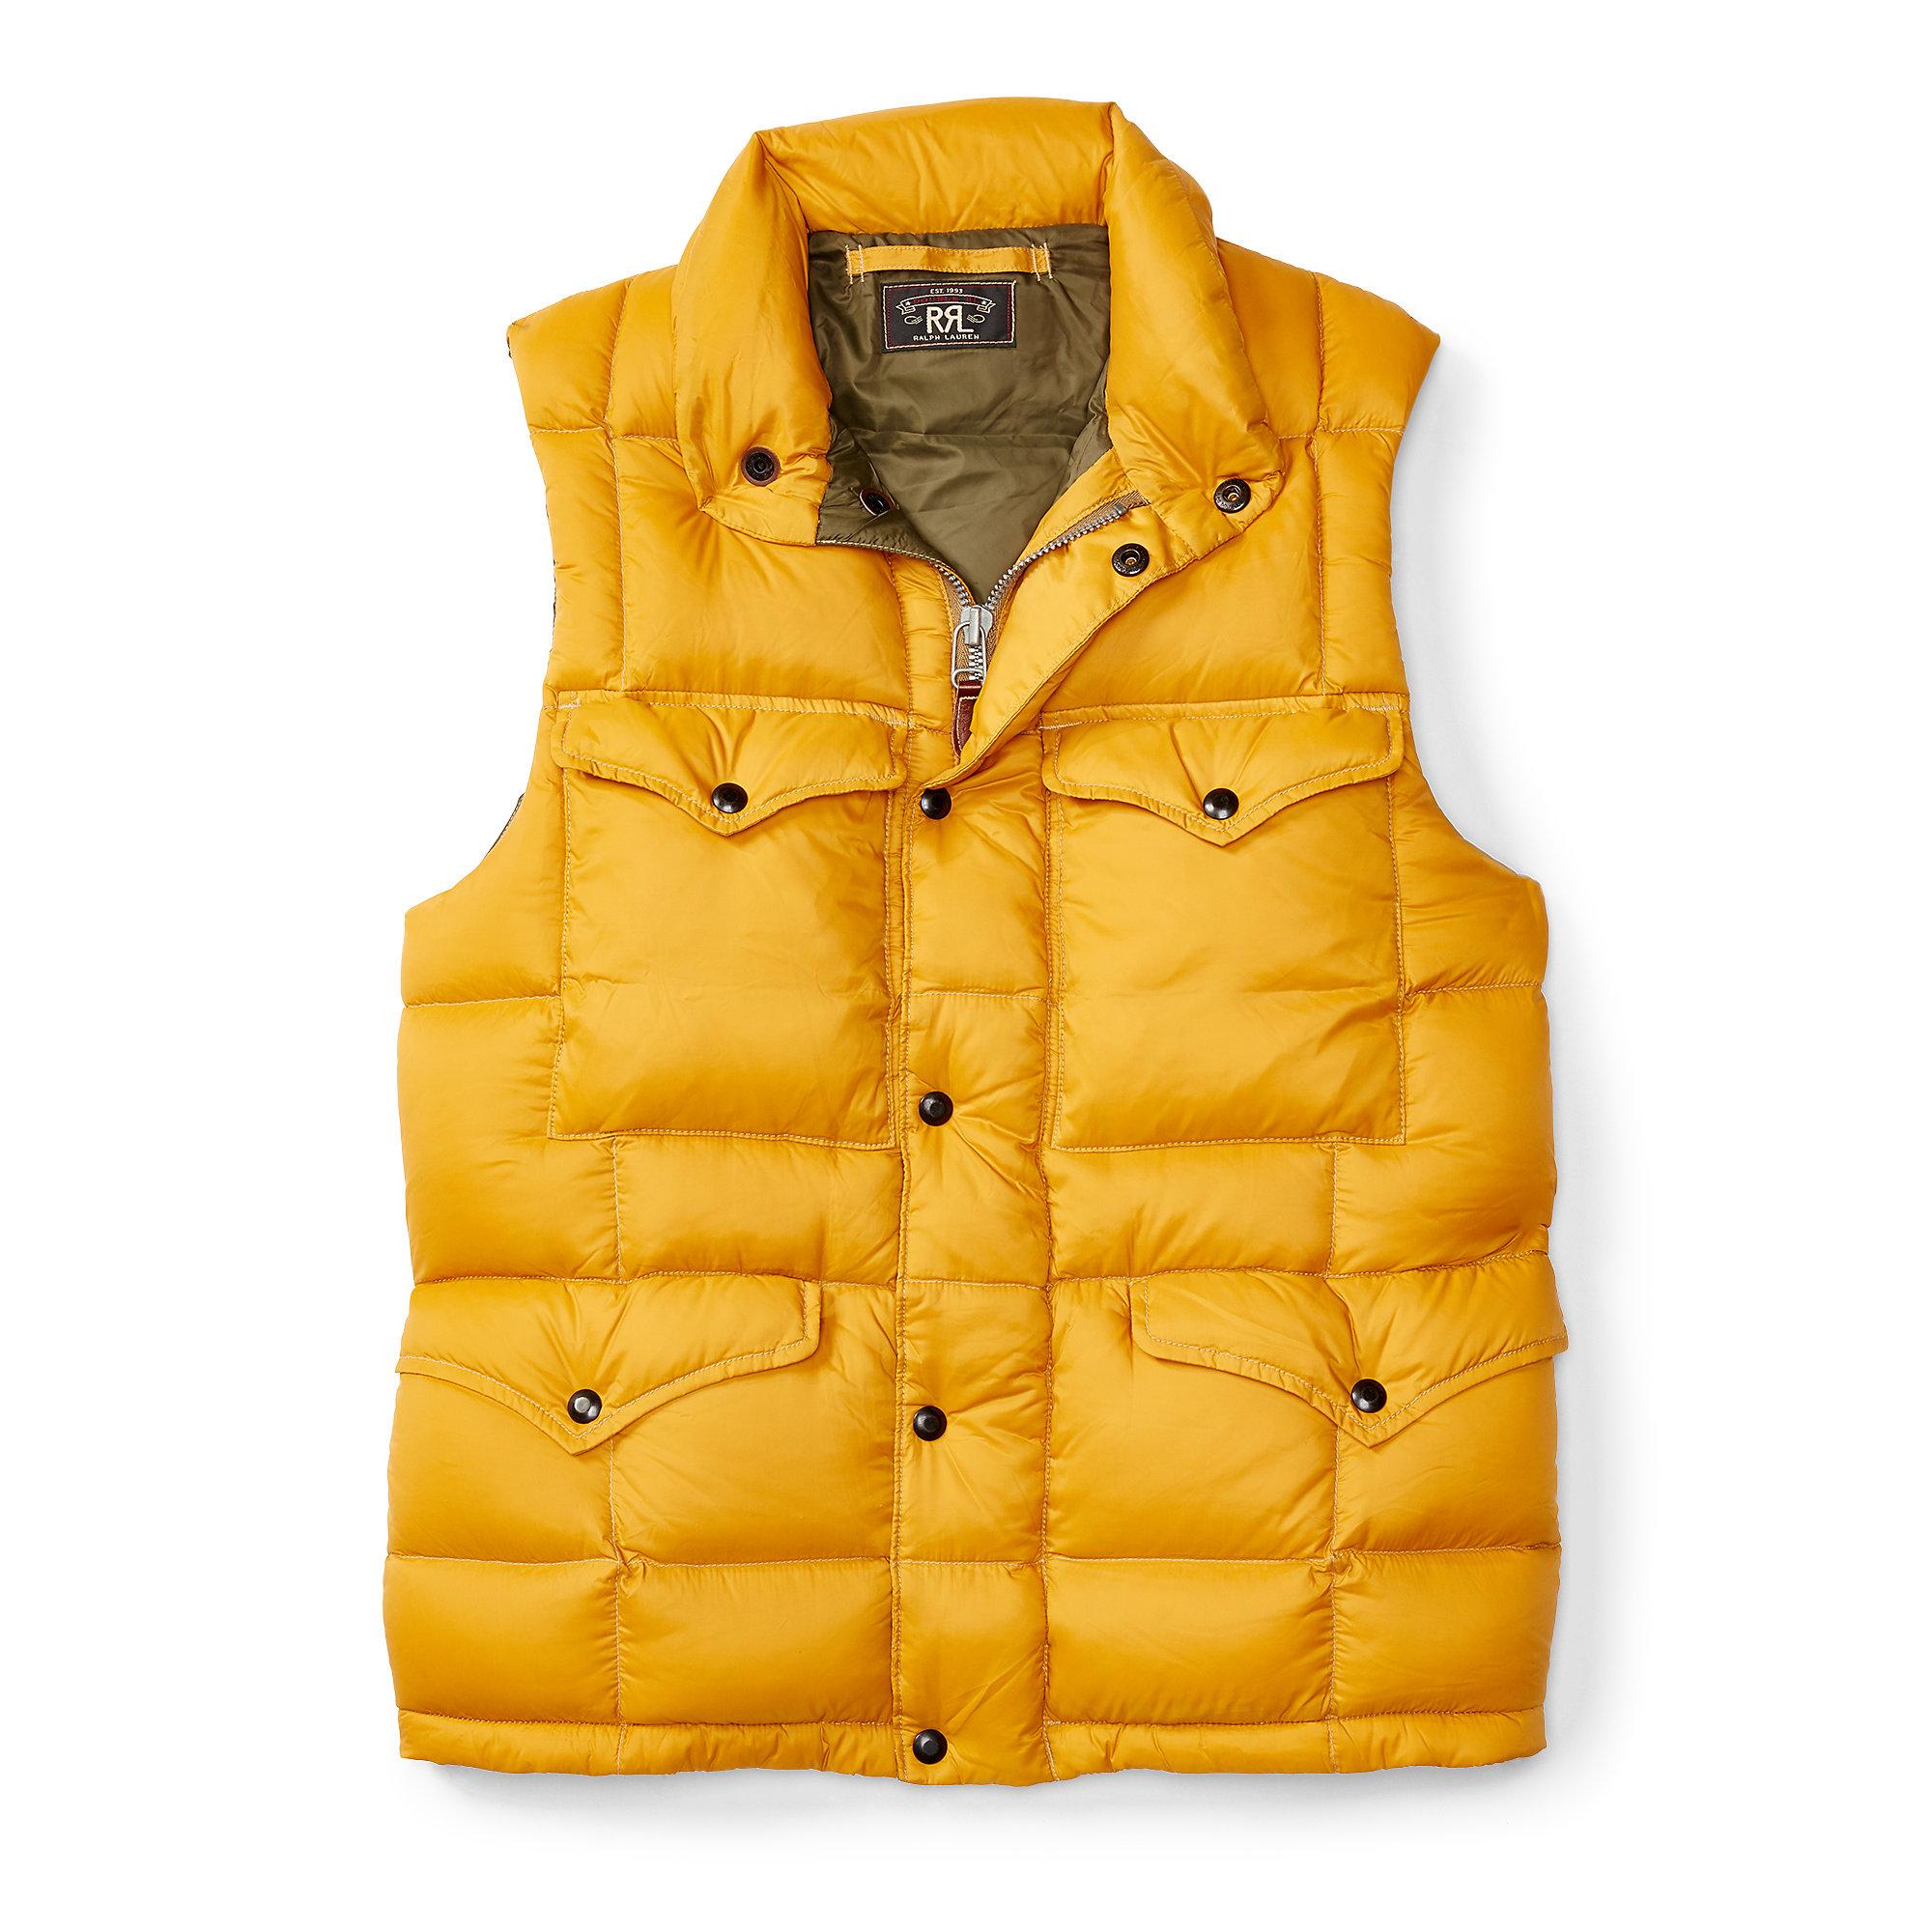 106281896-mountain yellow-c9072e11-.jpeg